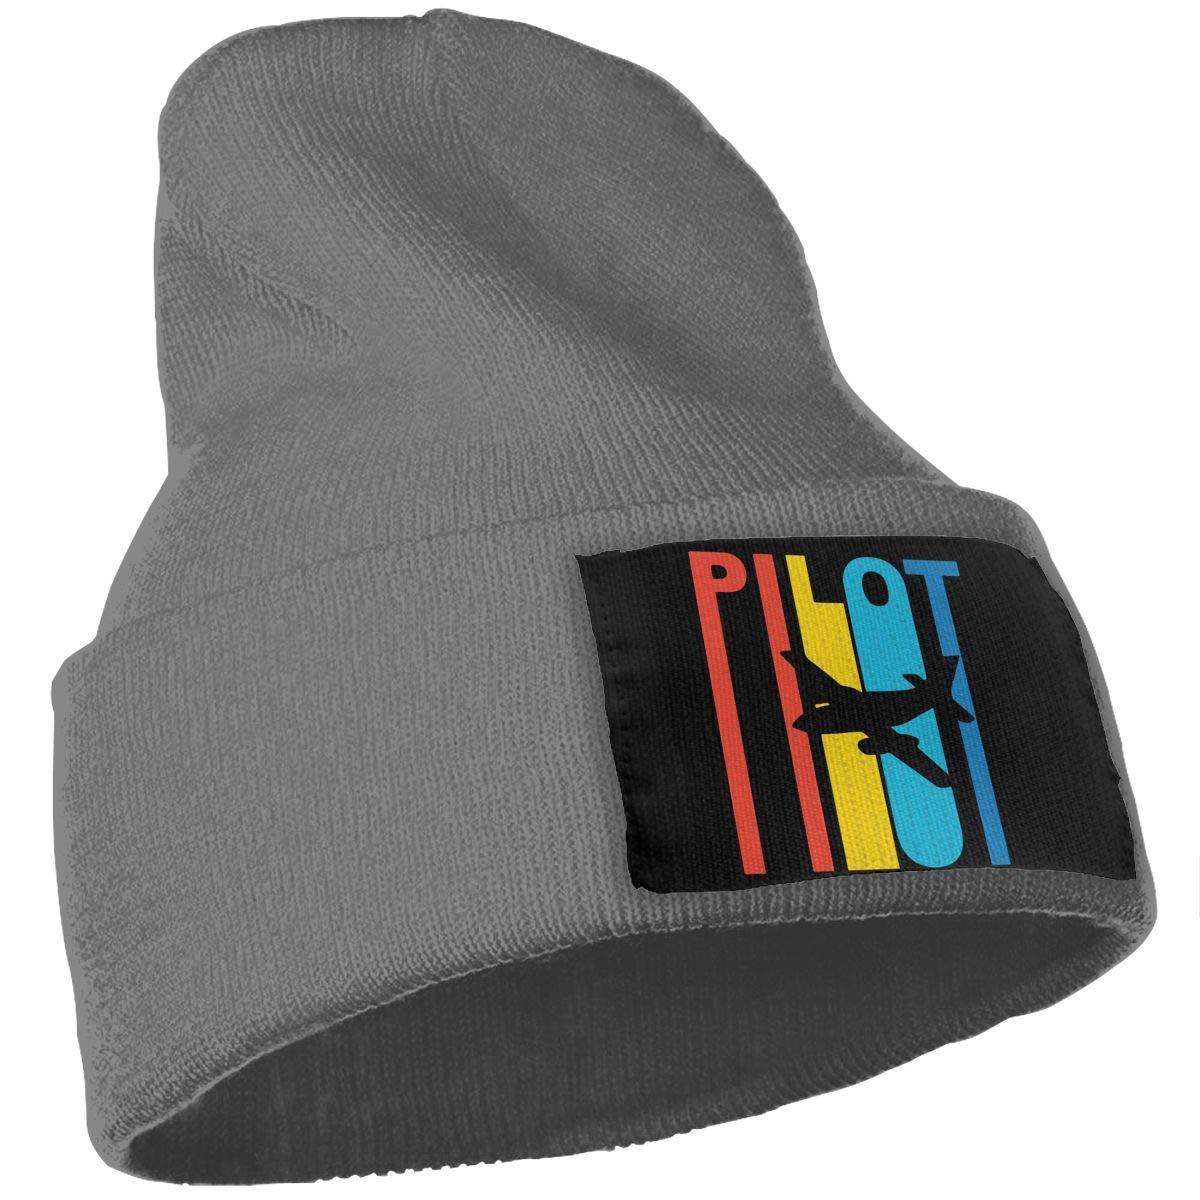 Vintage 1970s Style Airplane Pilot Beanie Cap Hat Men /& Women Knit Hats Stretchy /& Soft Beanie